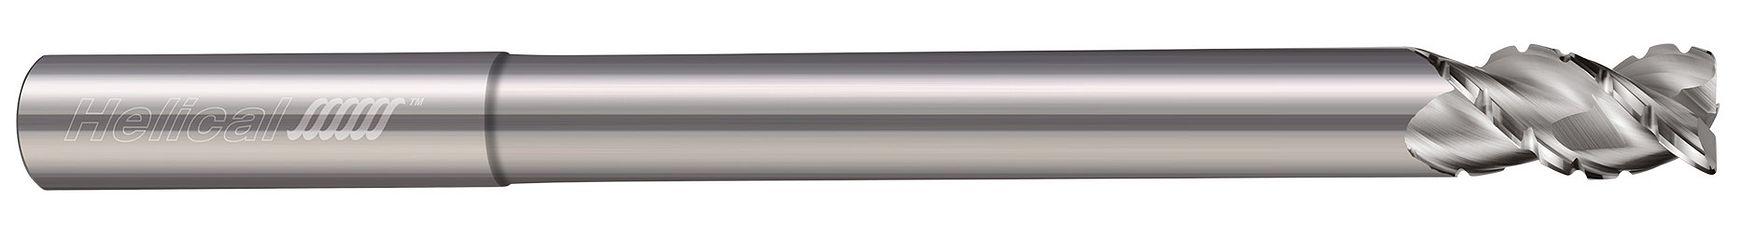 tool-details-28210